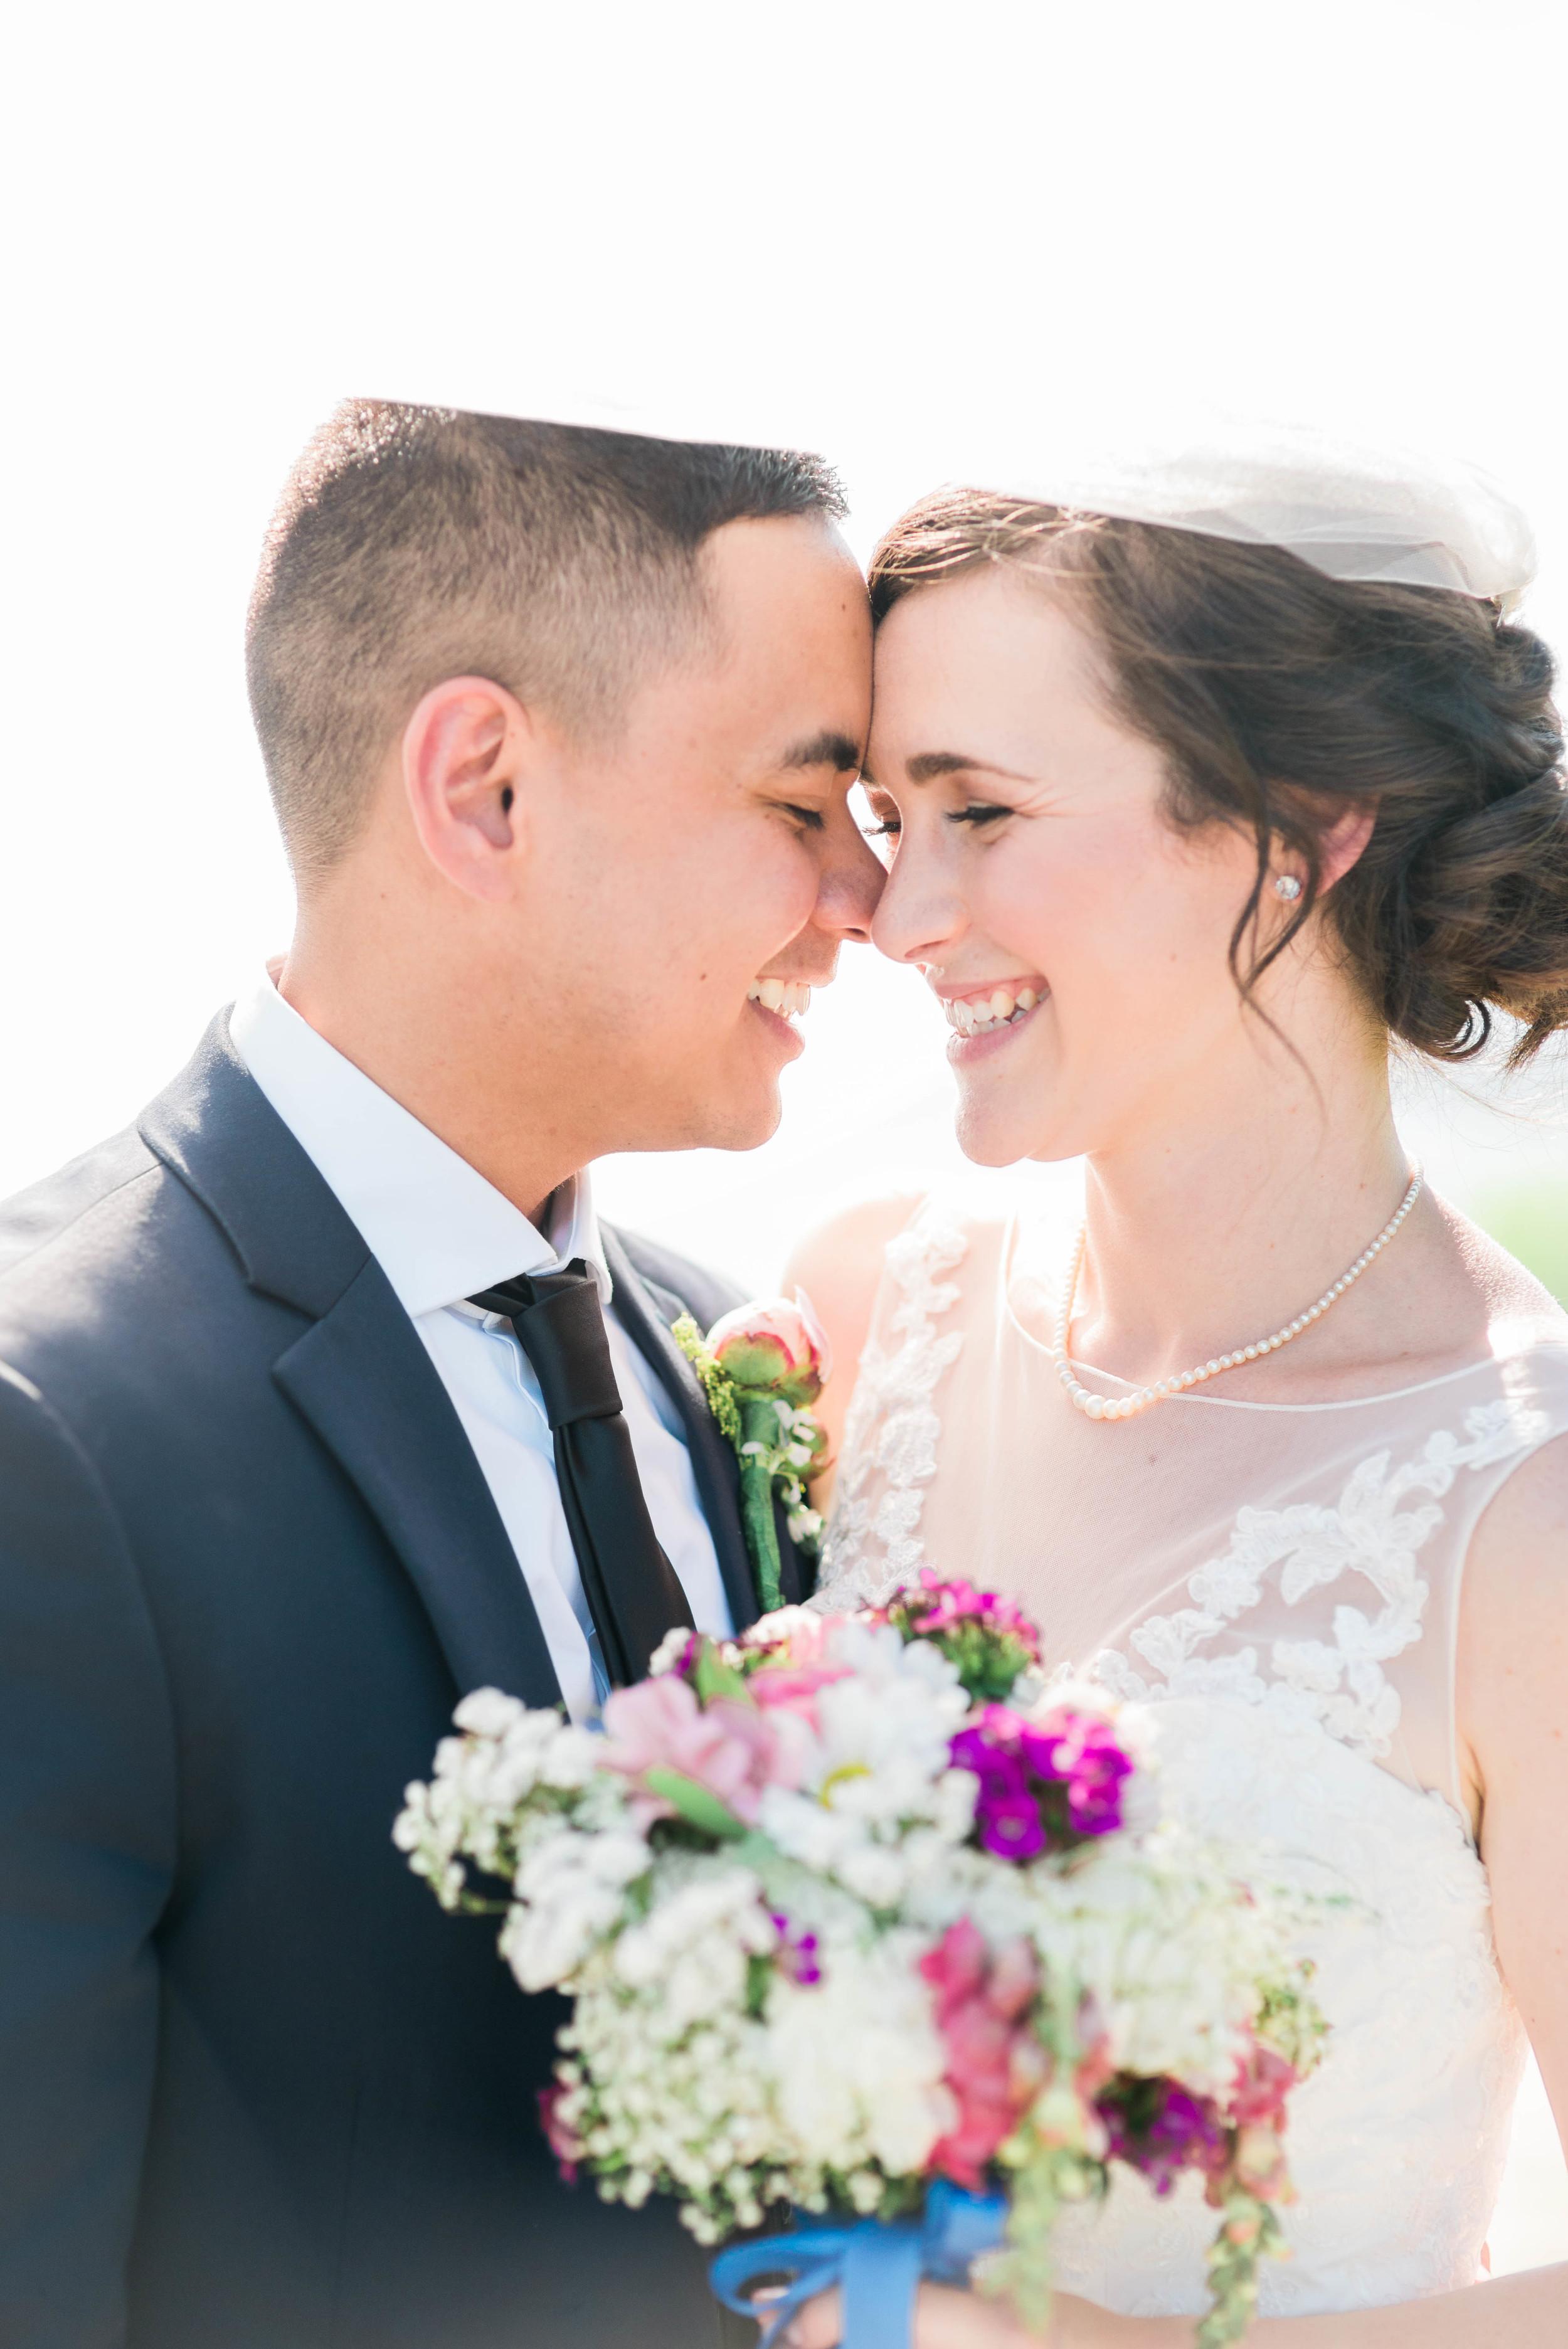 PREVIEWremowedding2016-45.jpg